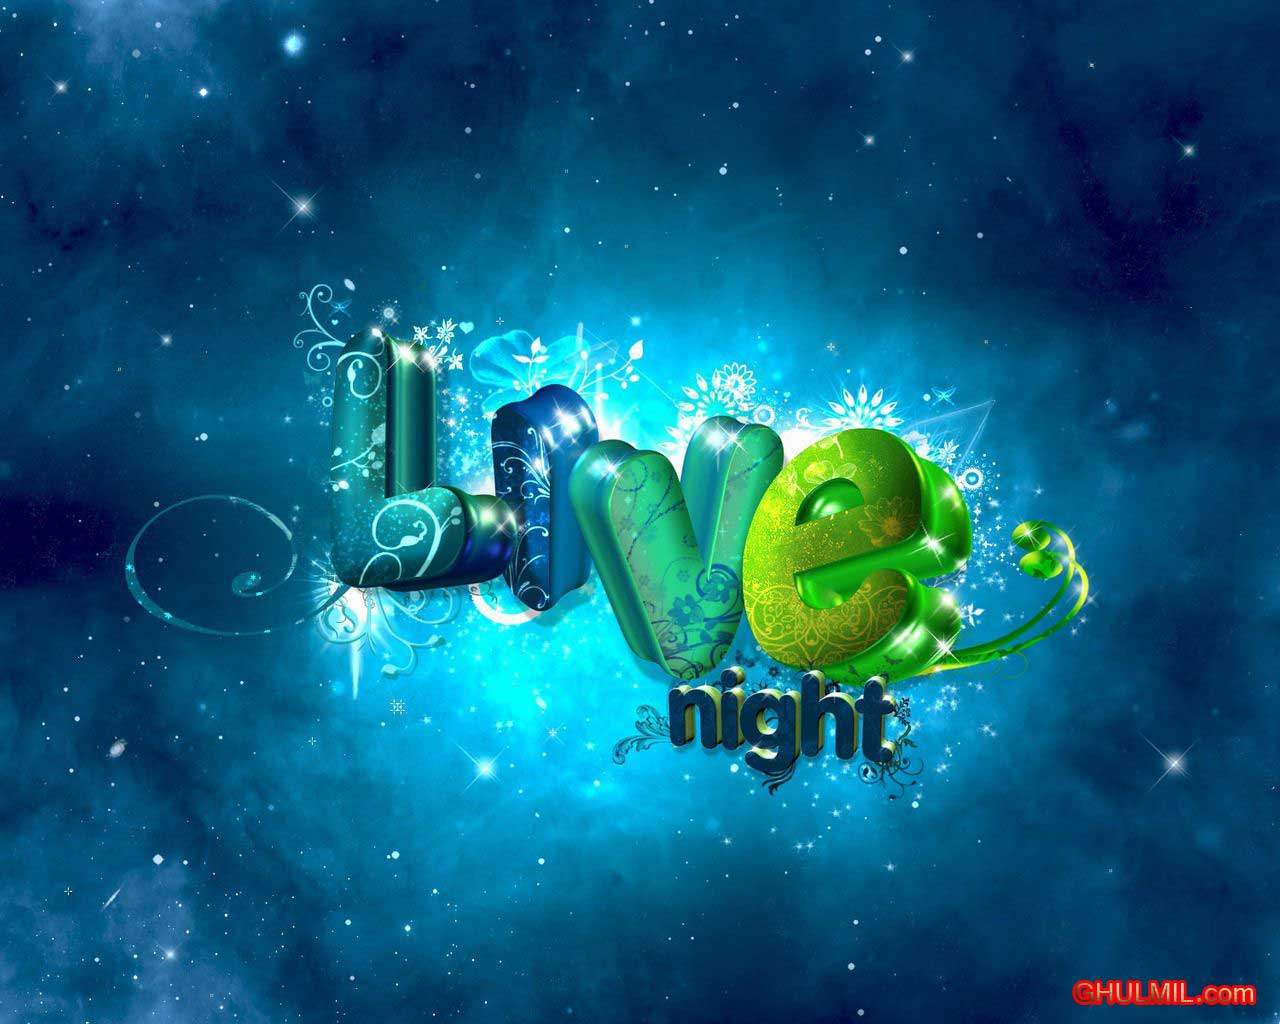 http://3.bp.blogspot.com/_3nJCVp7HBOw/TUDhUnmGJWI/AAAAAAAAABQ/56swK9s2p74/s1600/love-night-latest-style-wallpaper.jpg